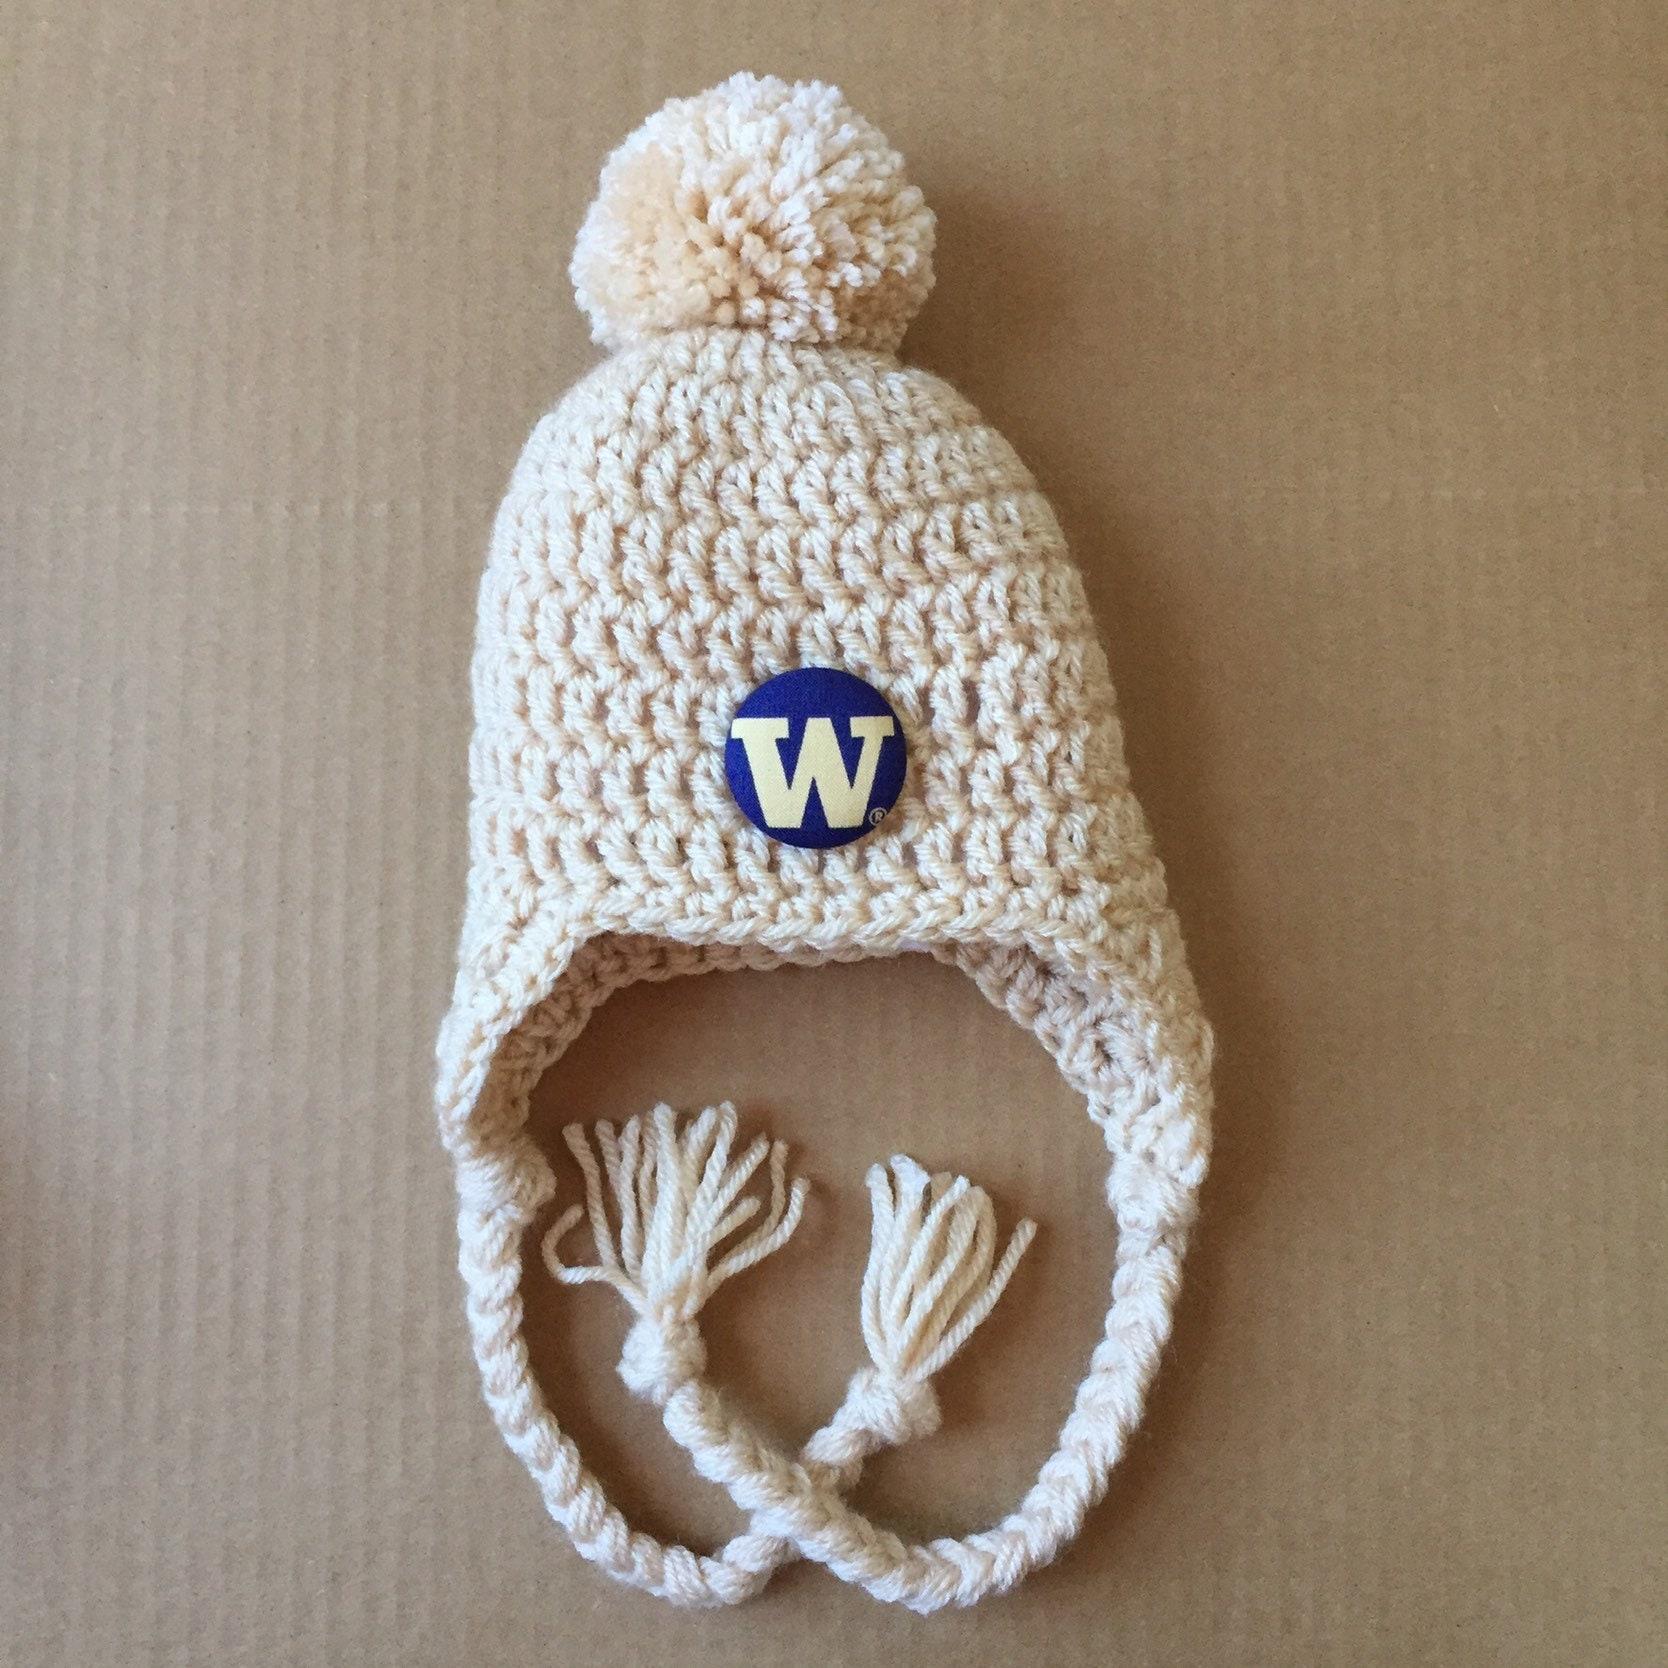 db3f55cd8a1 University of Washington Huskies baby hat